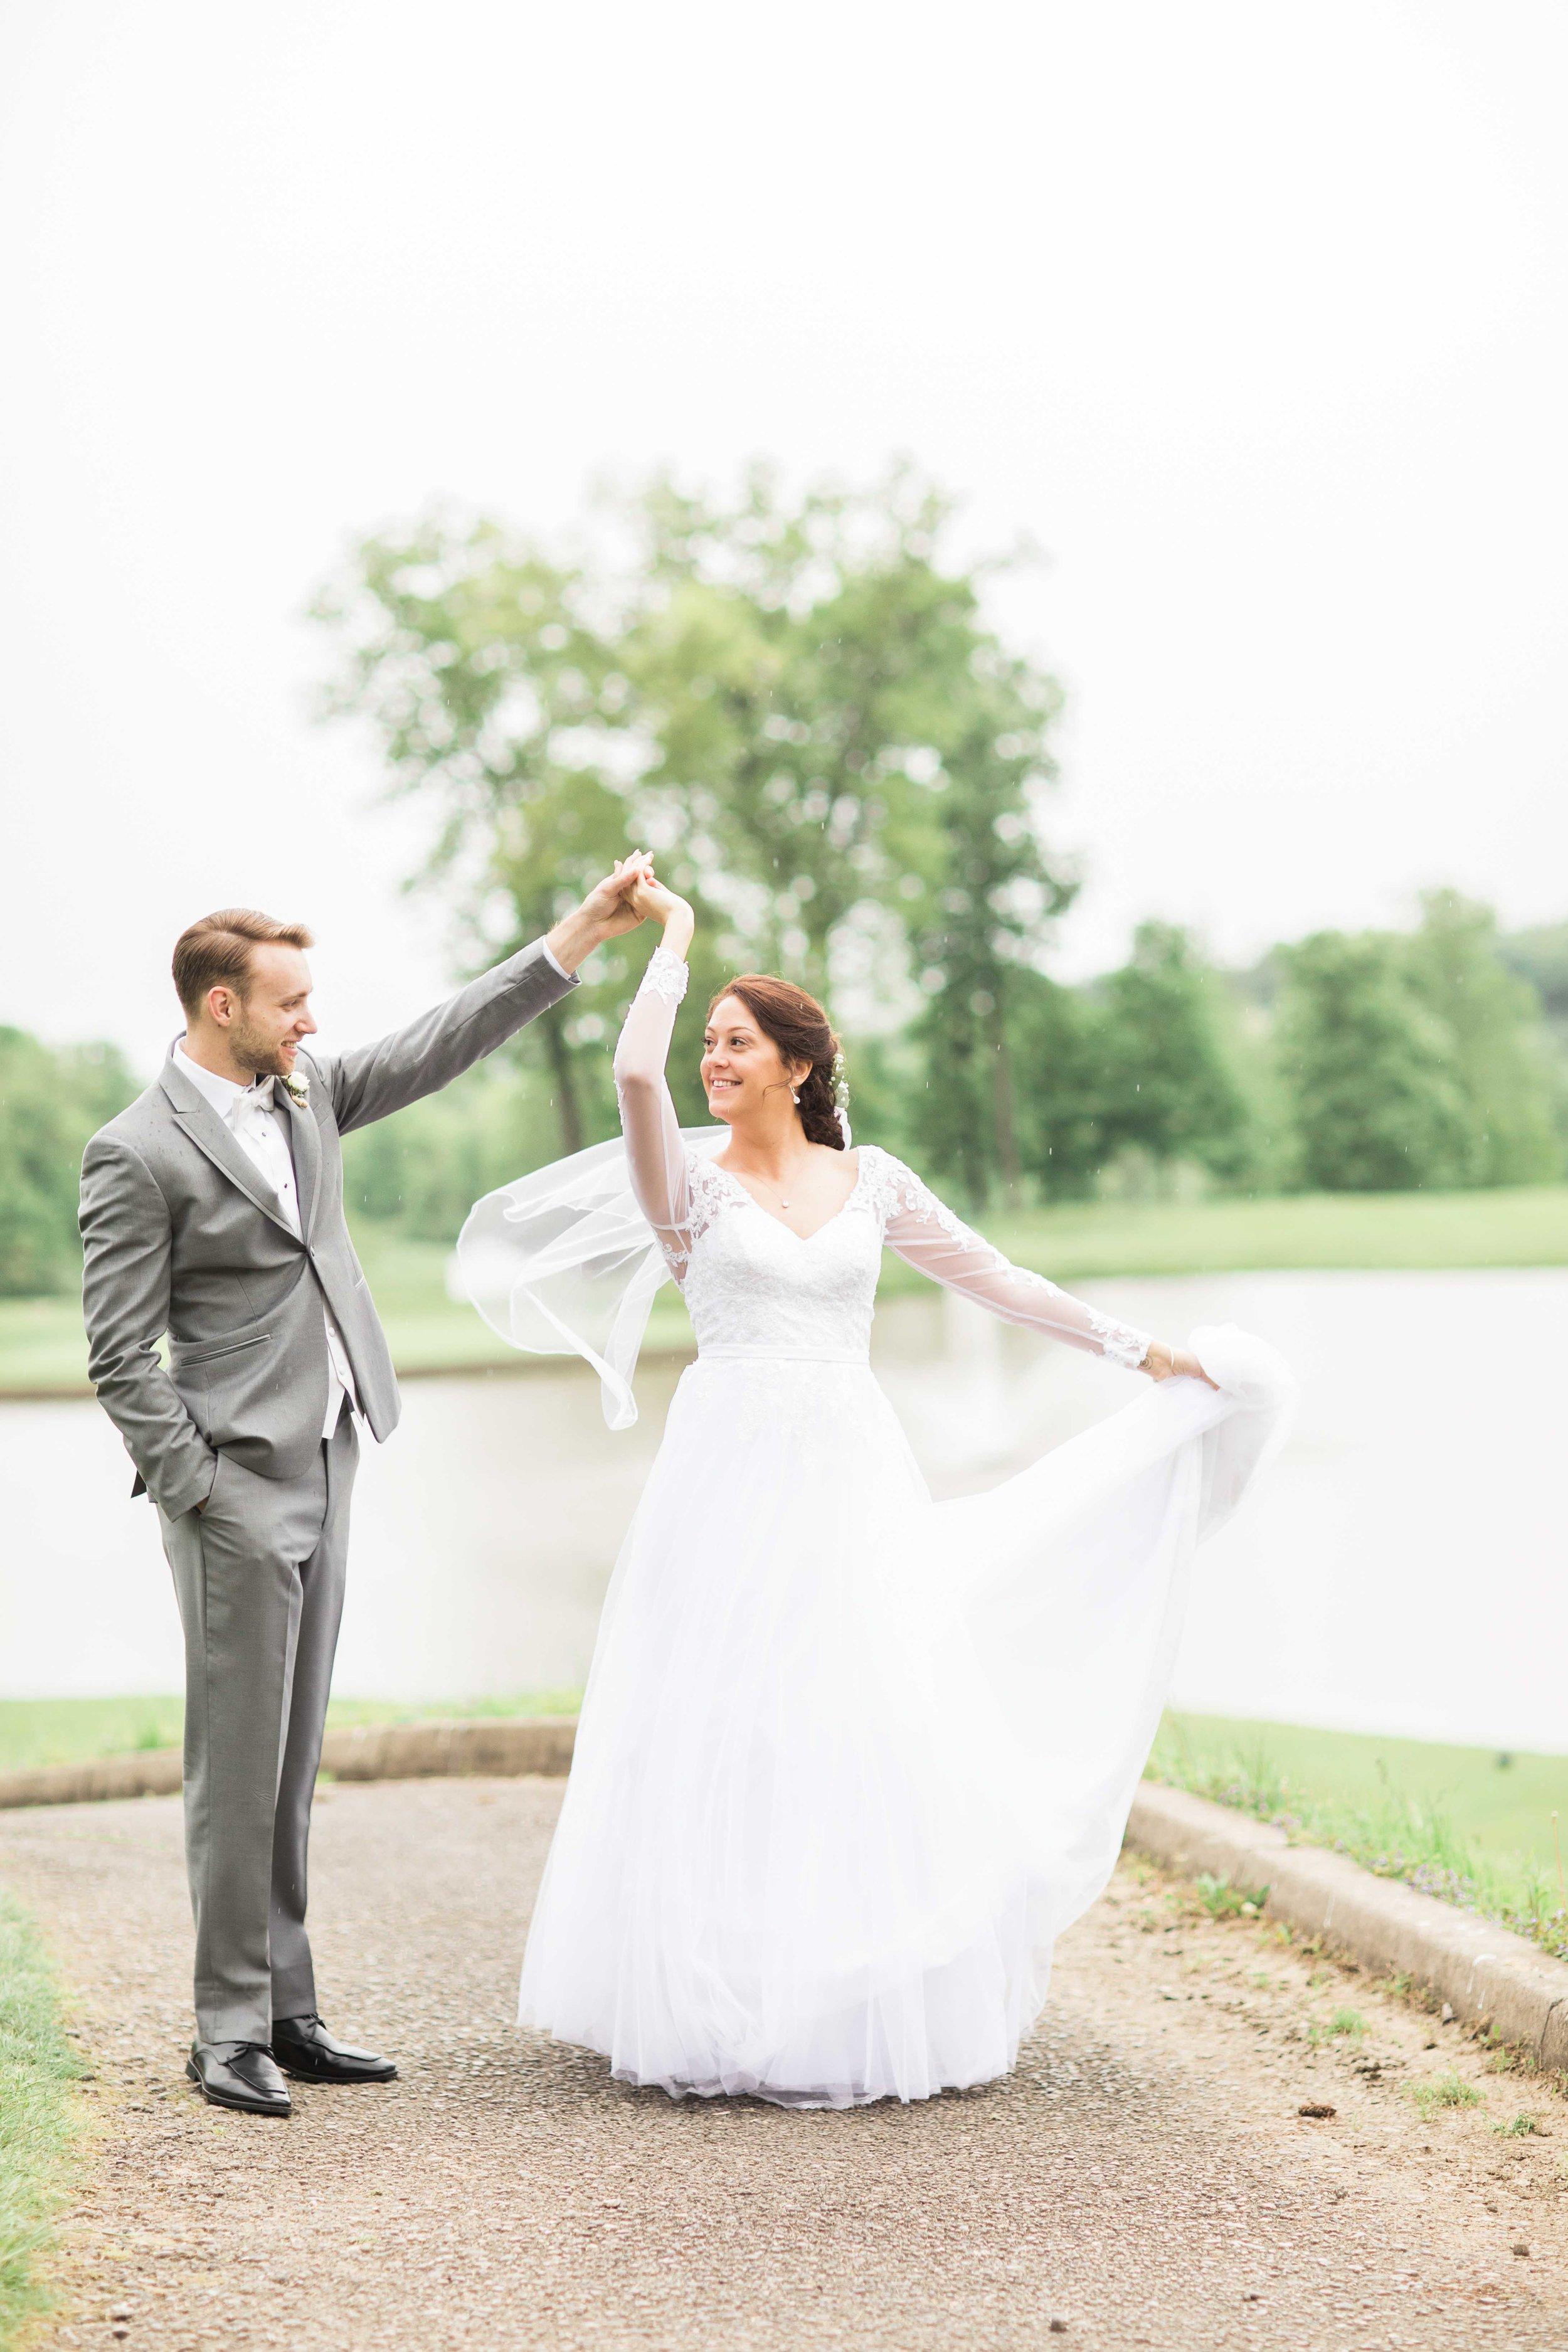 cincinnati wedding photographers lauren day photography-4.jpg